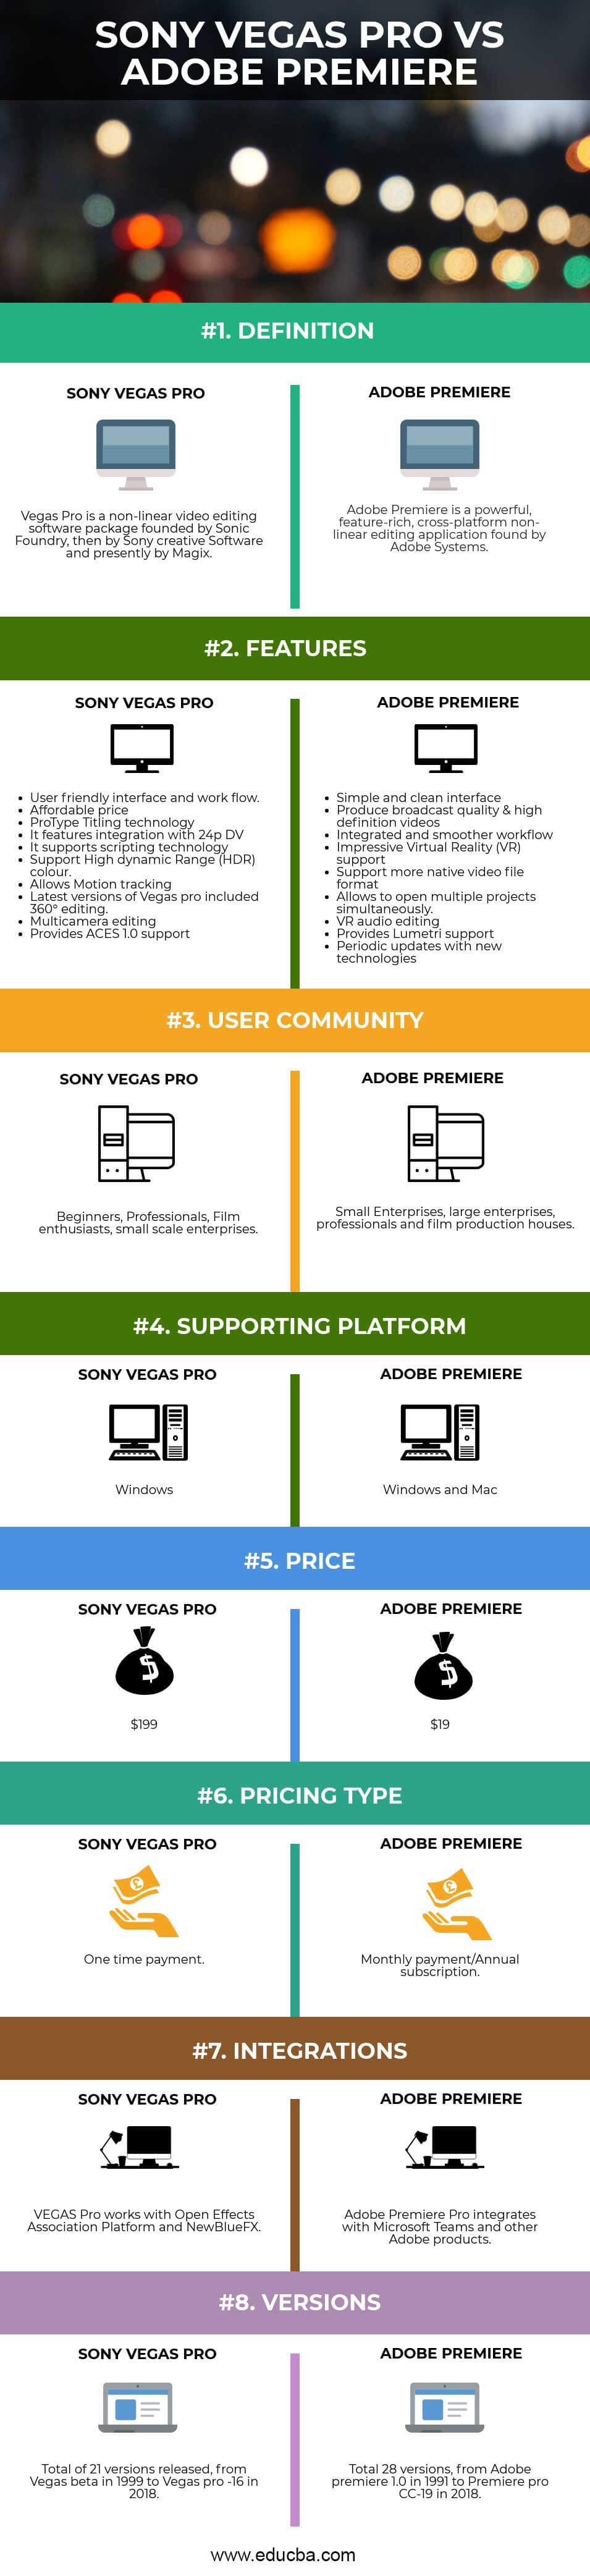 Sony Vegas Pro vs Adobe Premiere Infographics